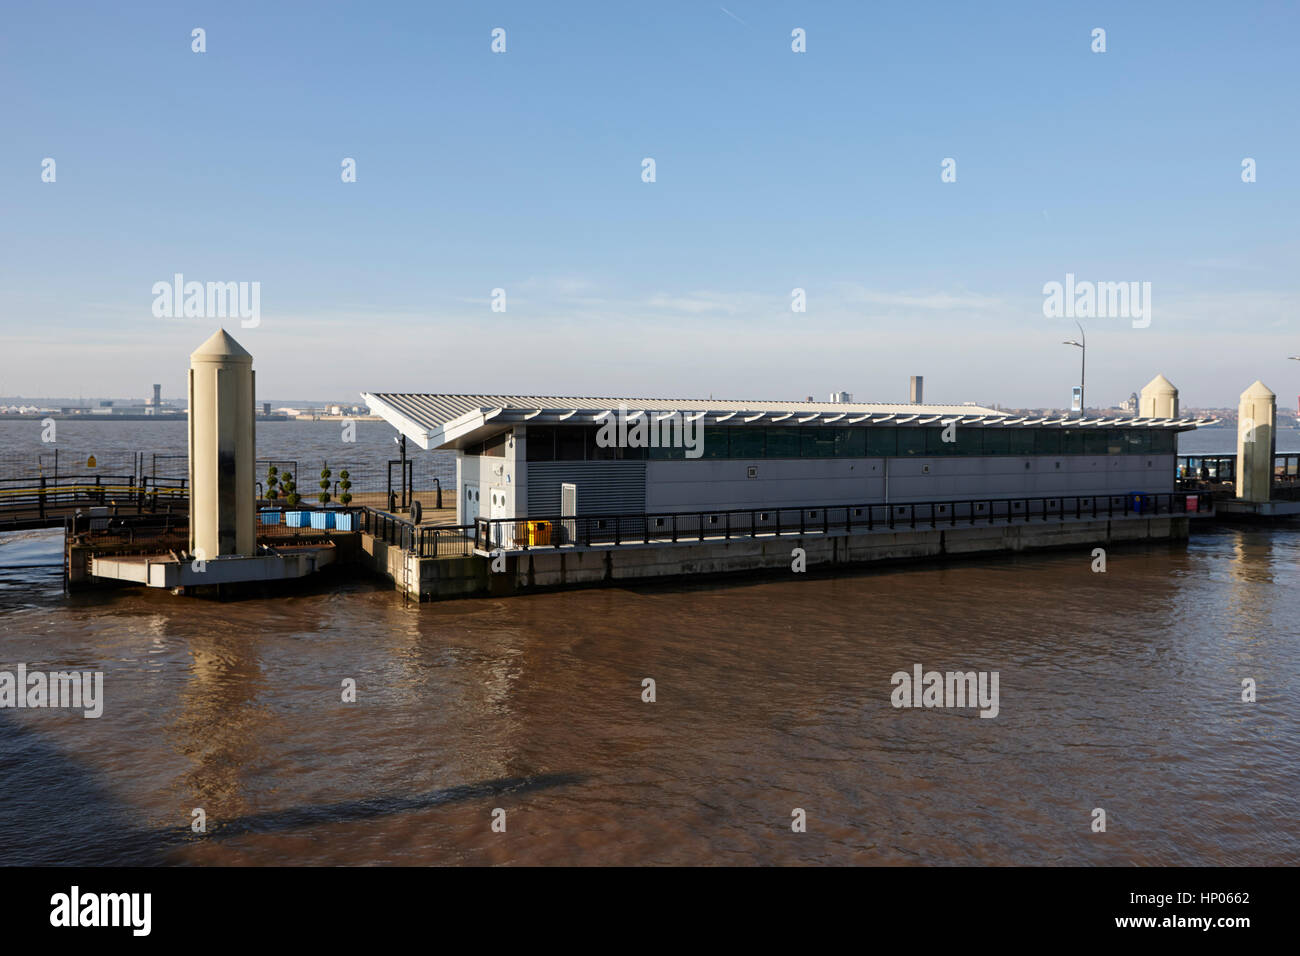 liverpool cruise terminal floating berth river mersey uk - Stock Image